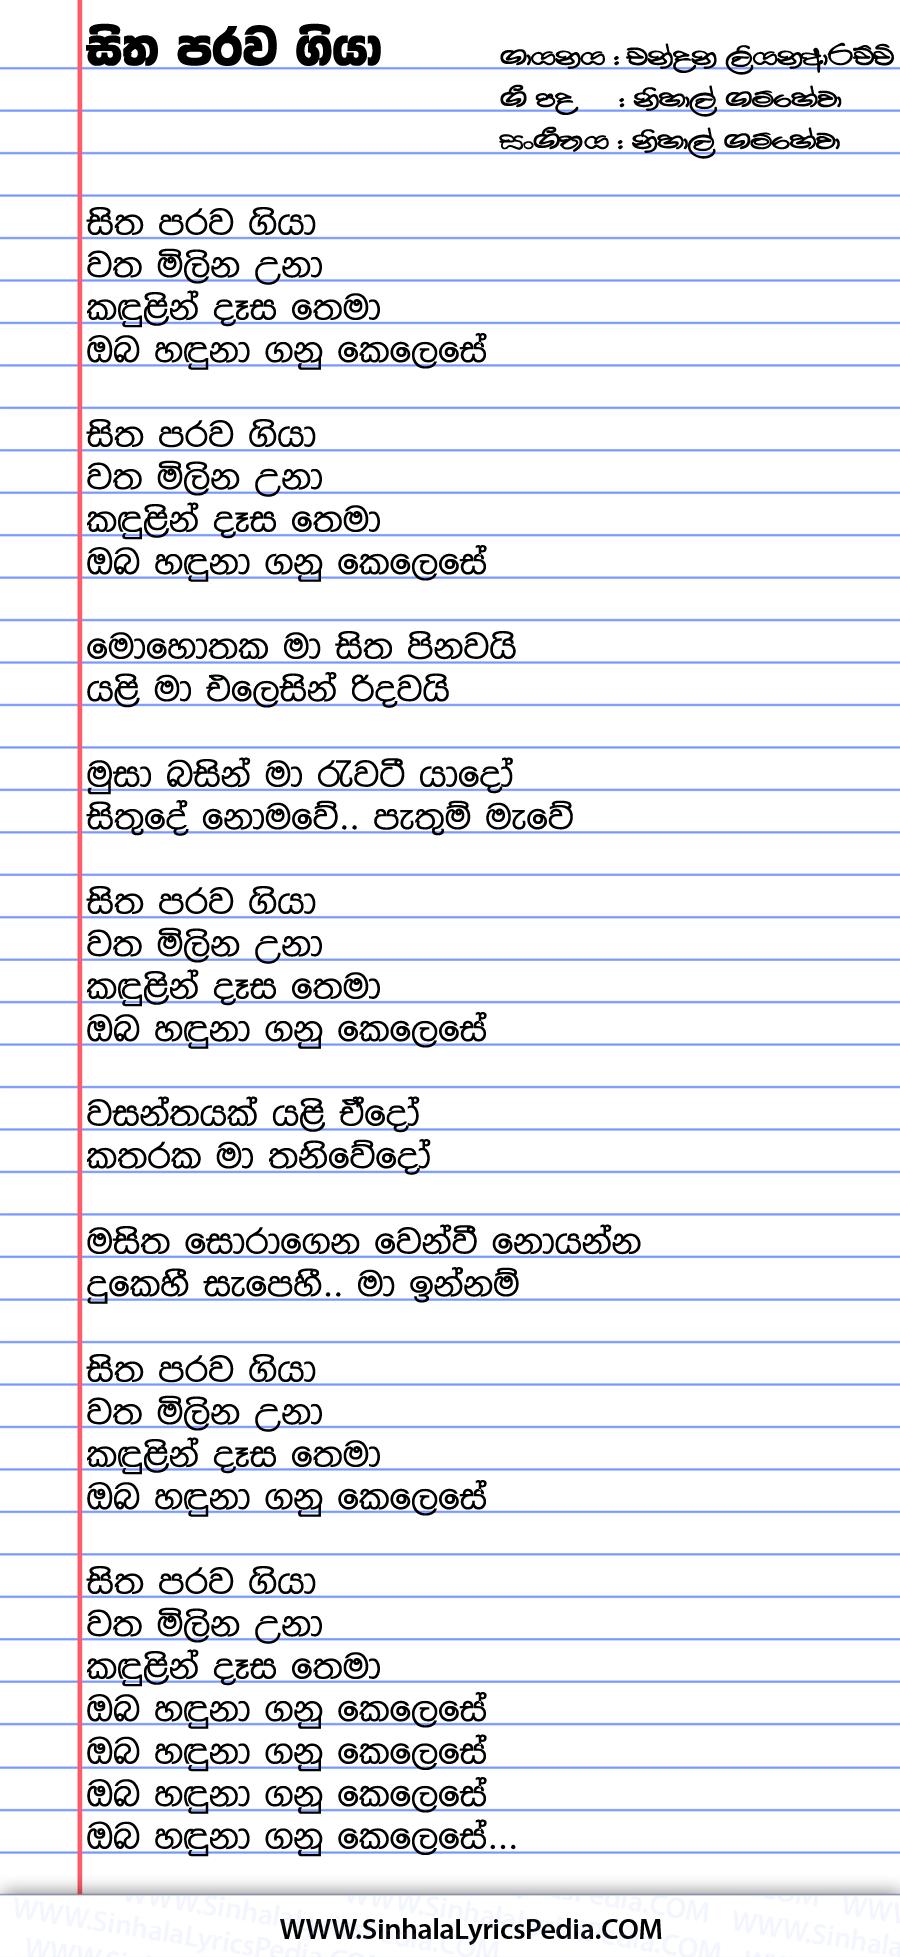 Sitha Parawa Giya Watha Milina Una Song Lyrics